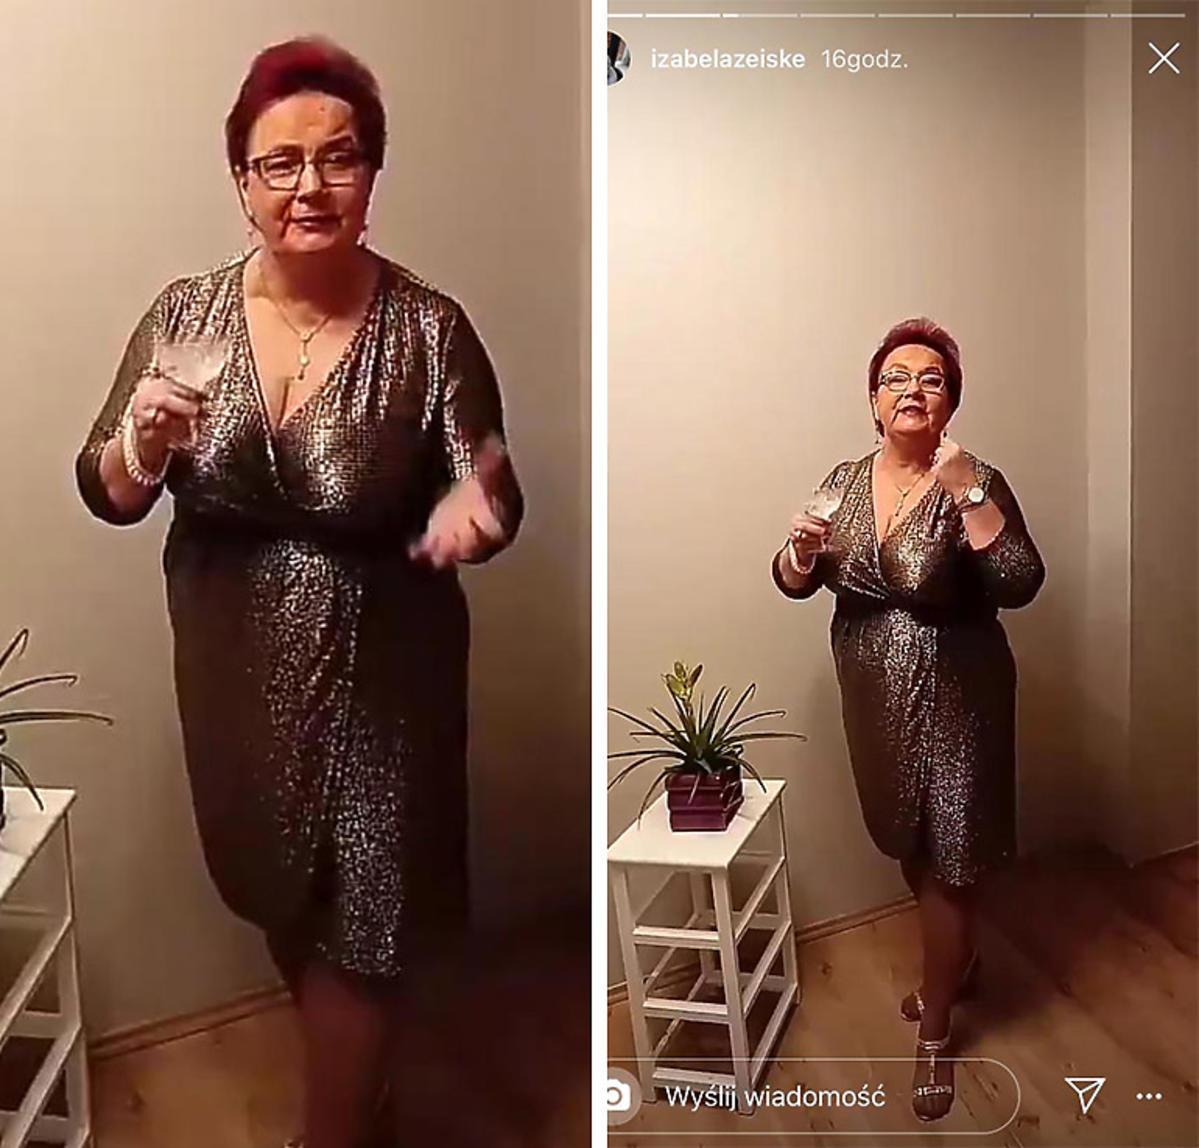 Izabela Zeiske na Sylwestra 2019/2020